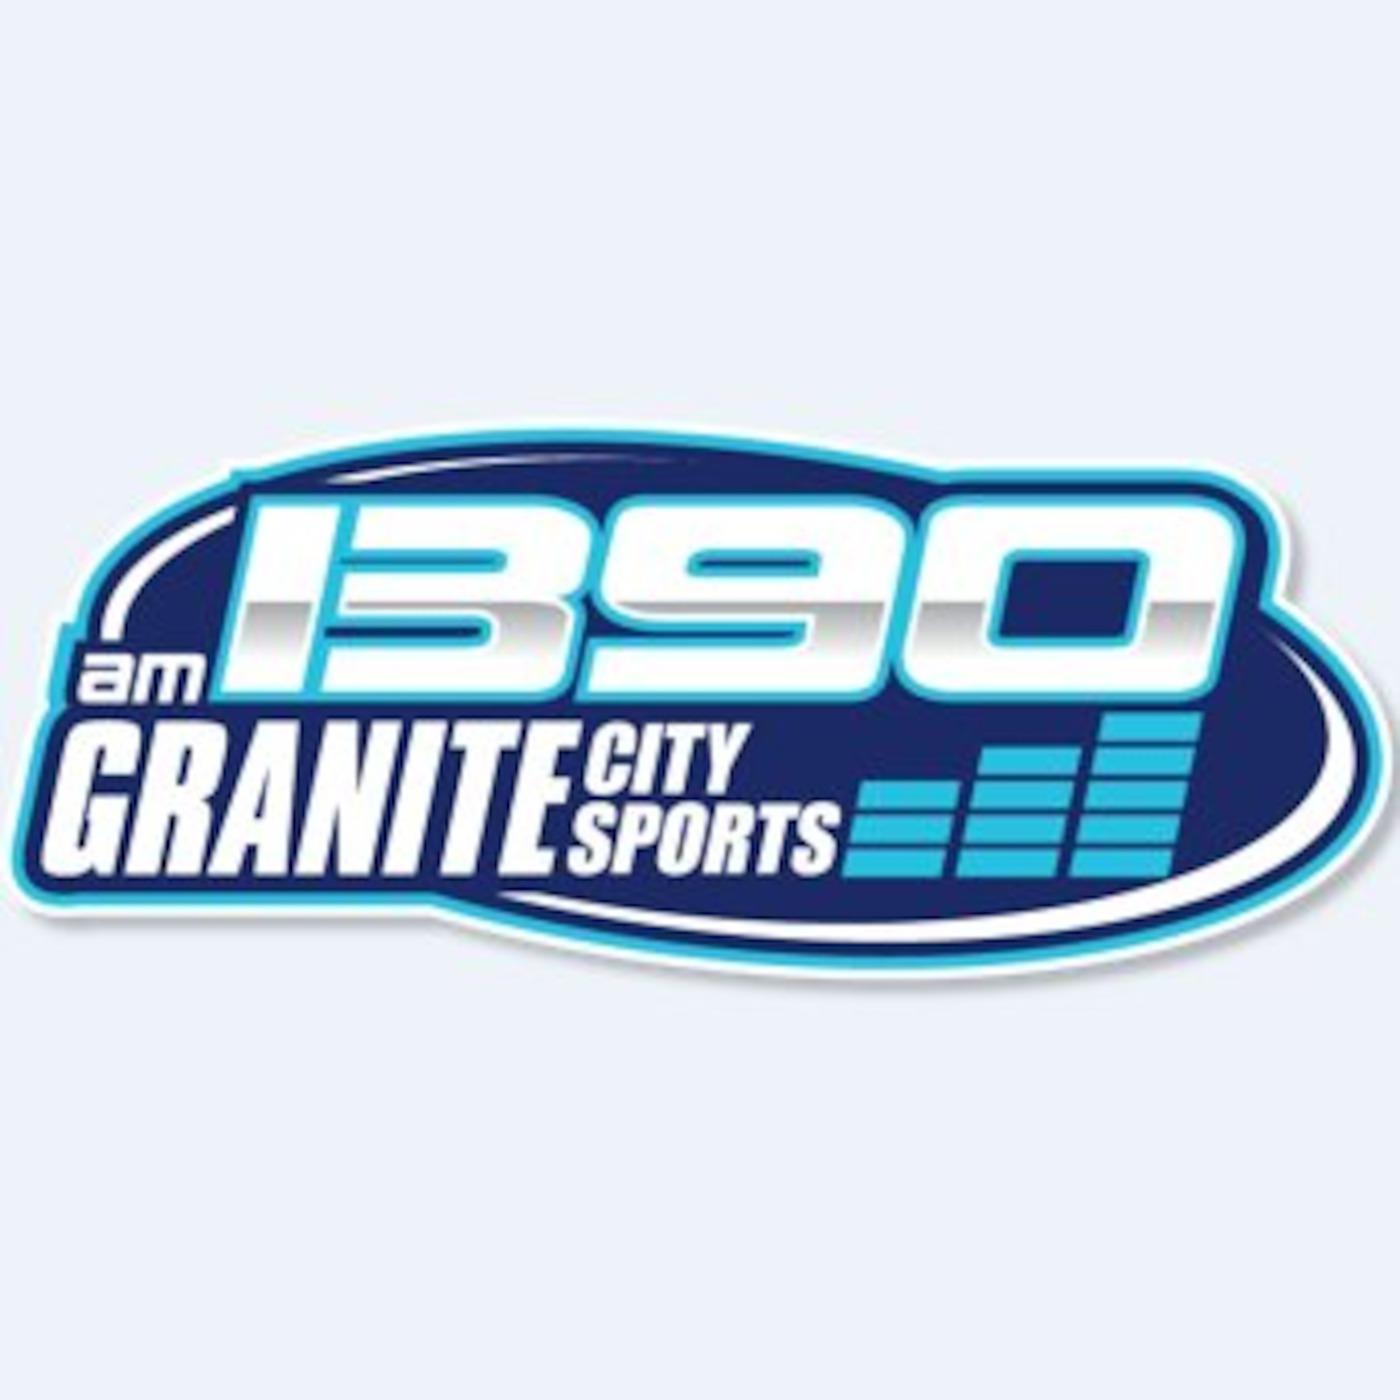 Granite City Sports